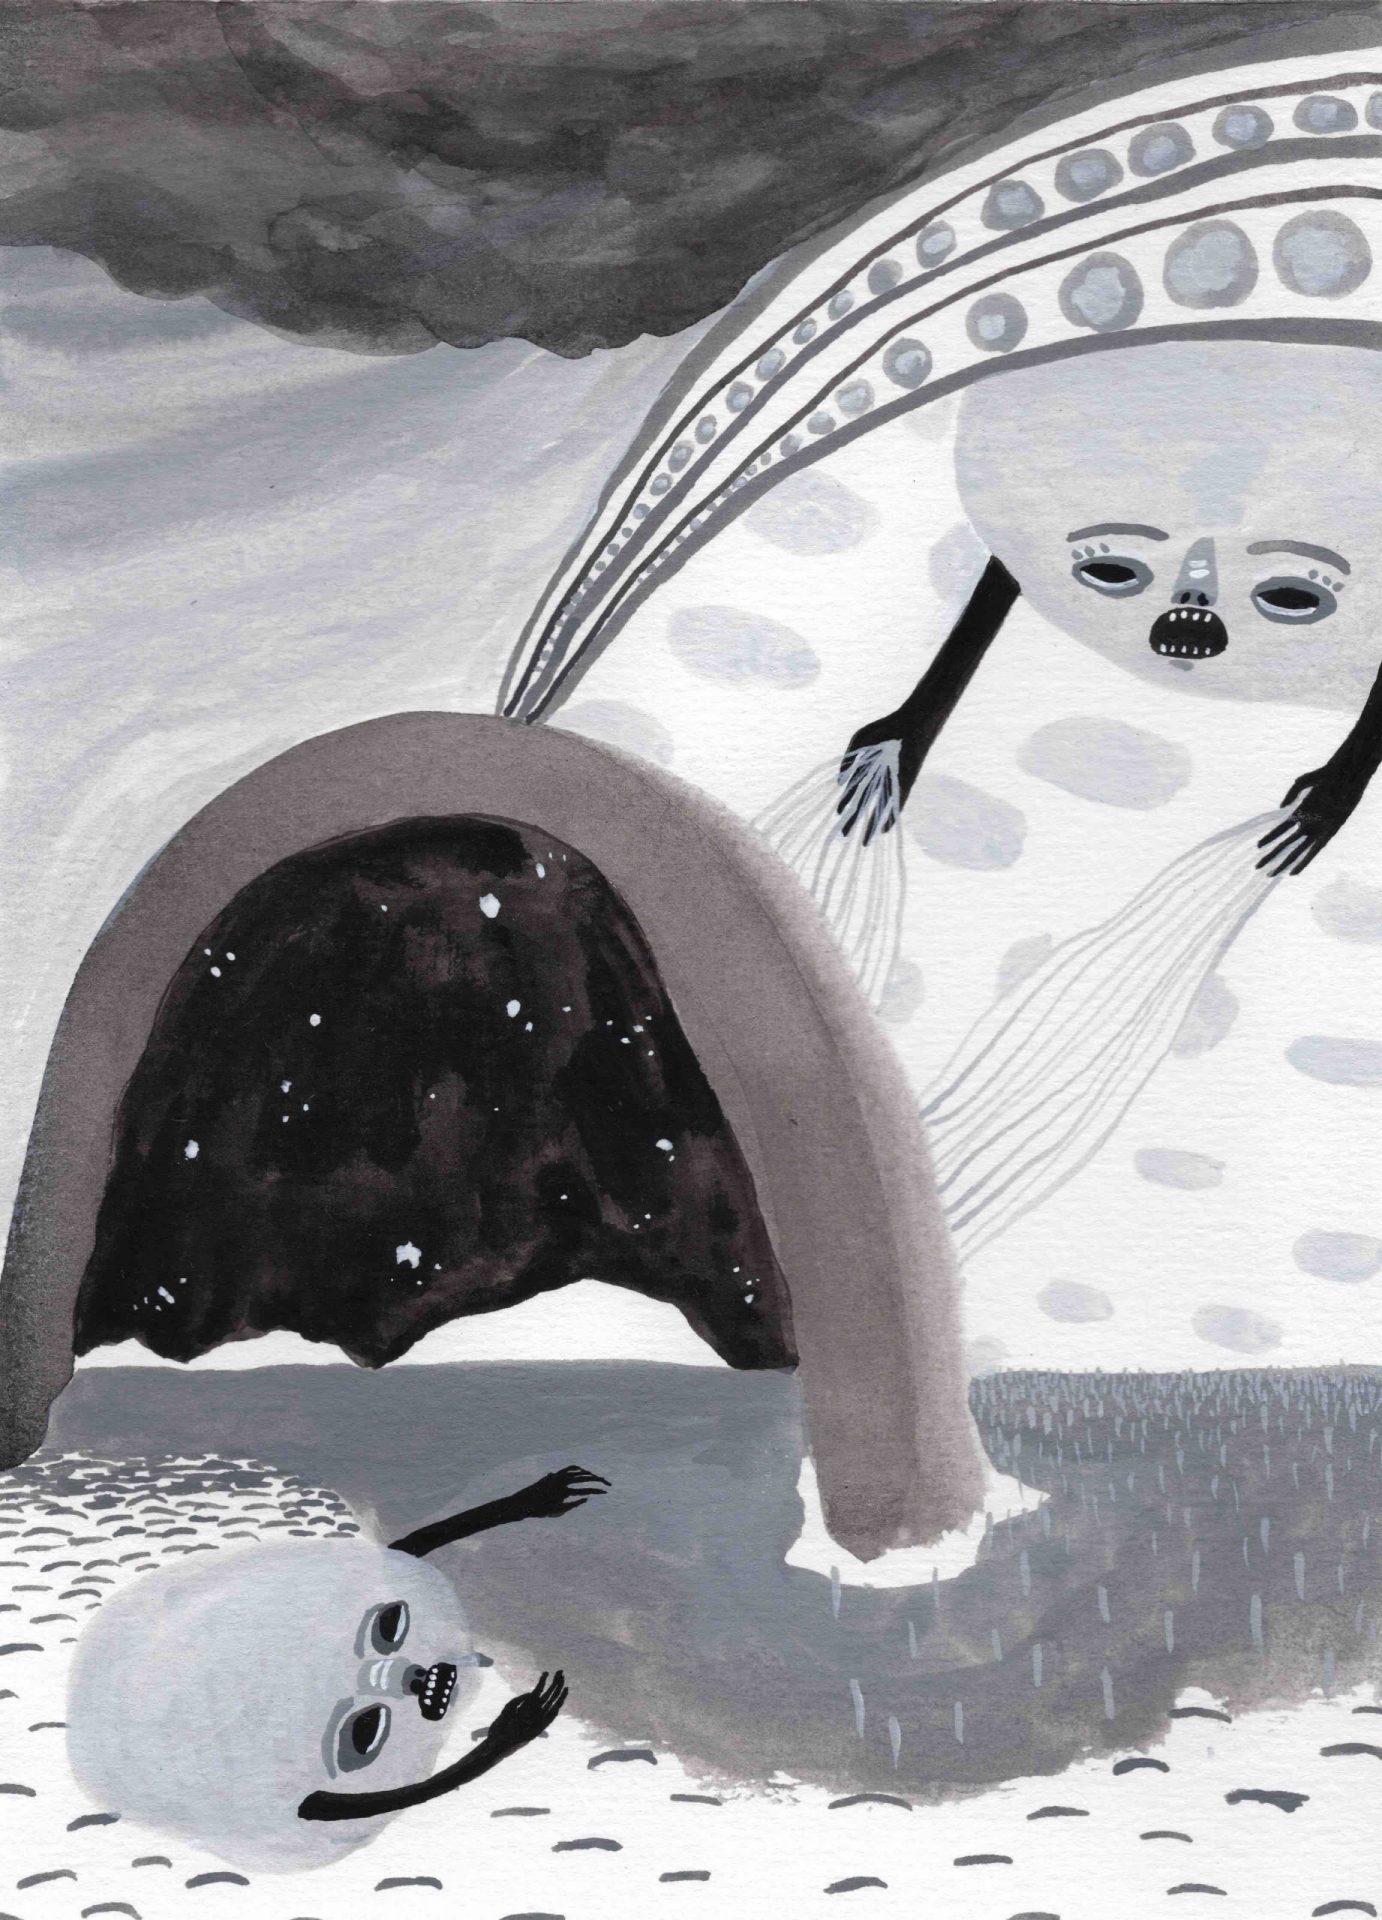 """Una maldición"" (2020) 14 x 19 cm. Acrylic gouache on paper."